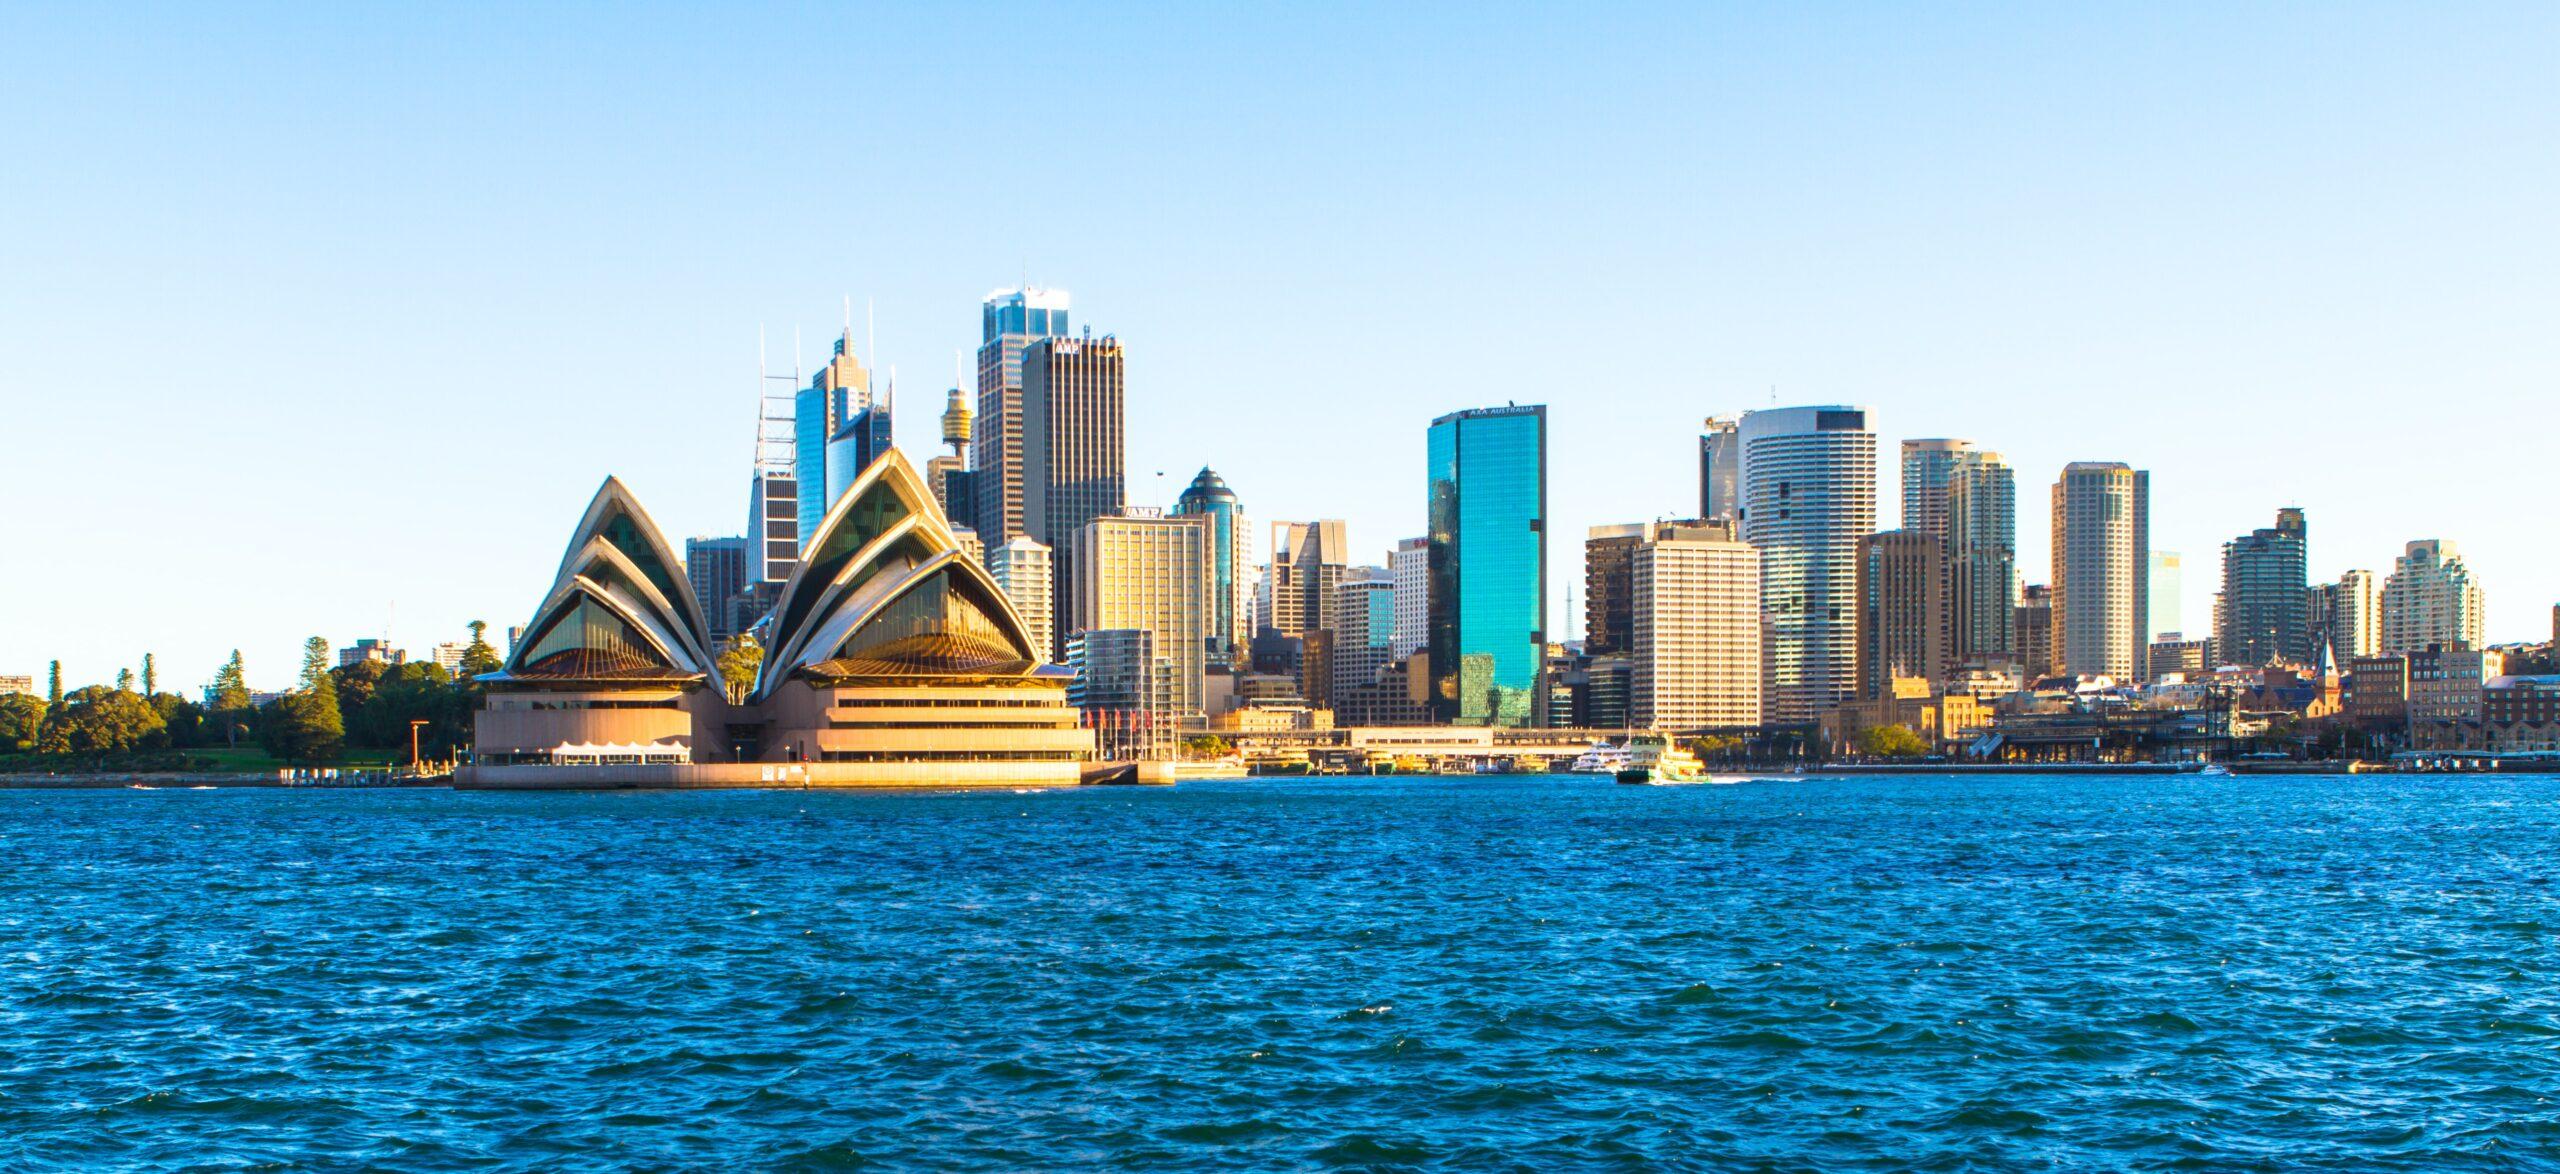 Australia-Housing-Affordability-The-Internet-Bull-Report